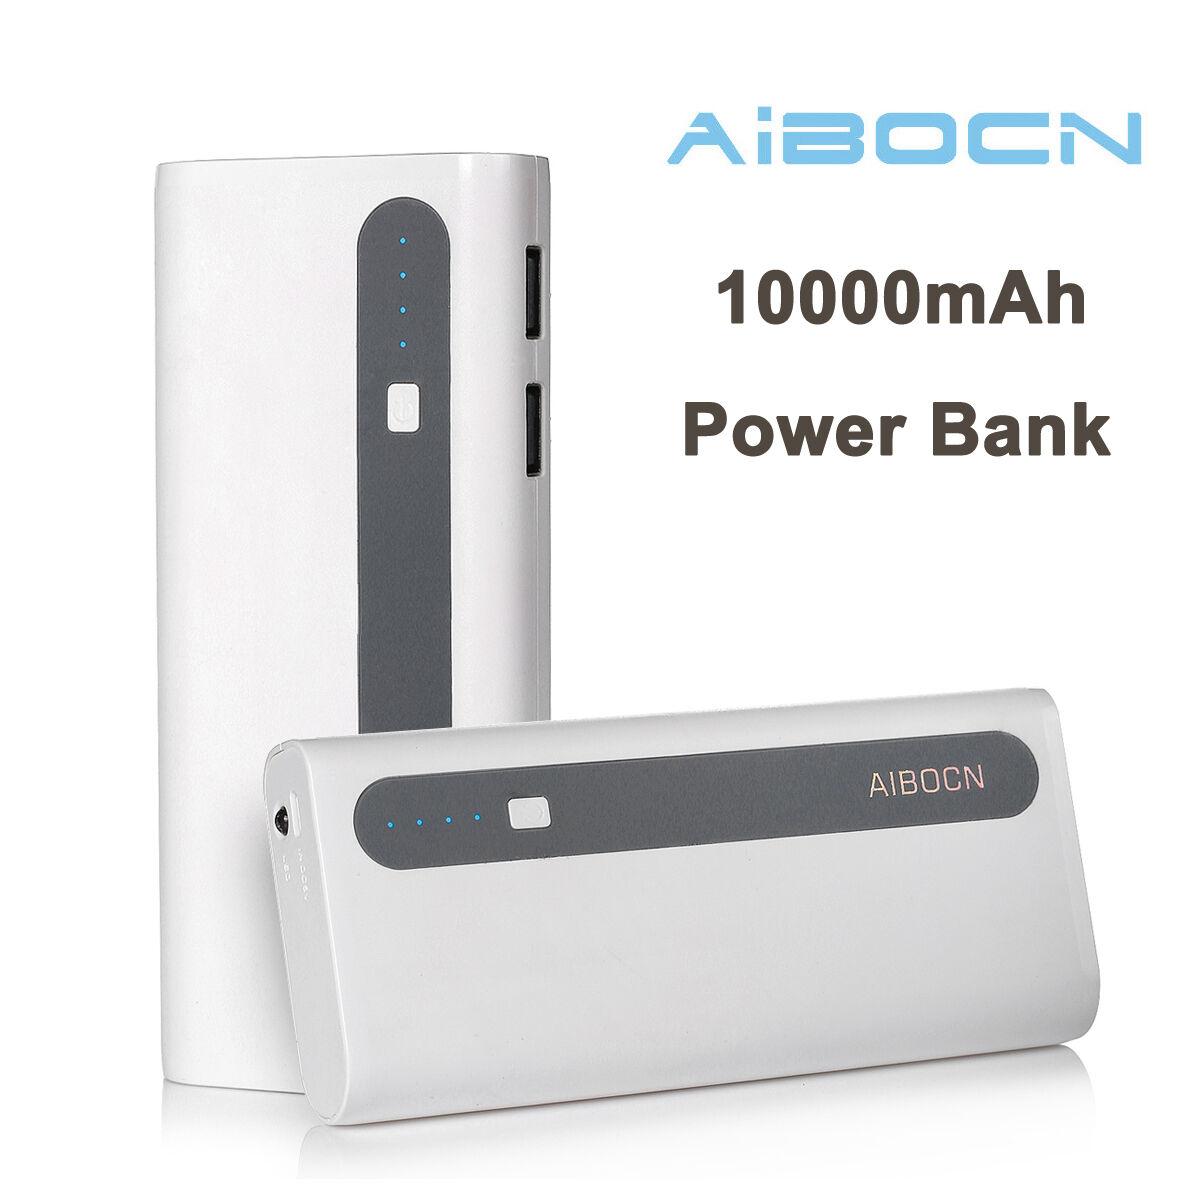 Aibocn Portable 10000mAh Dual USB Port External Cell Battery